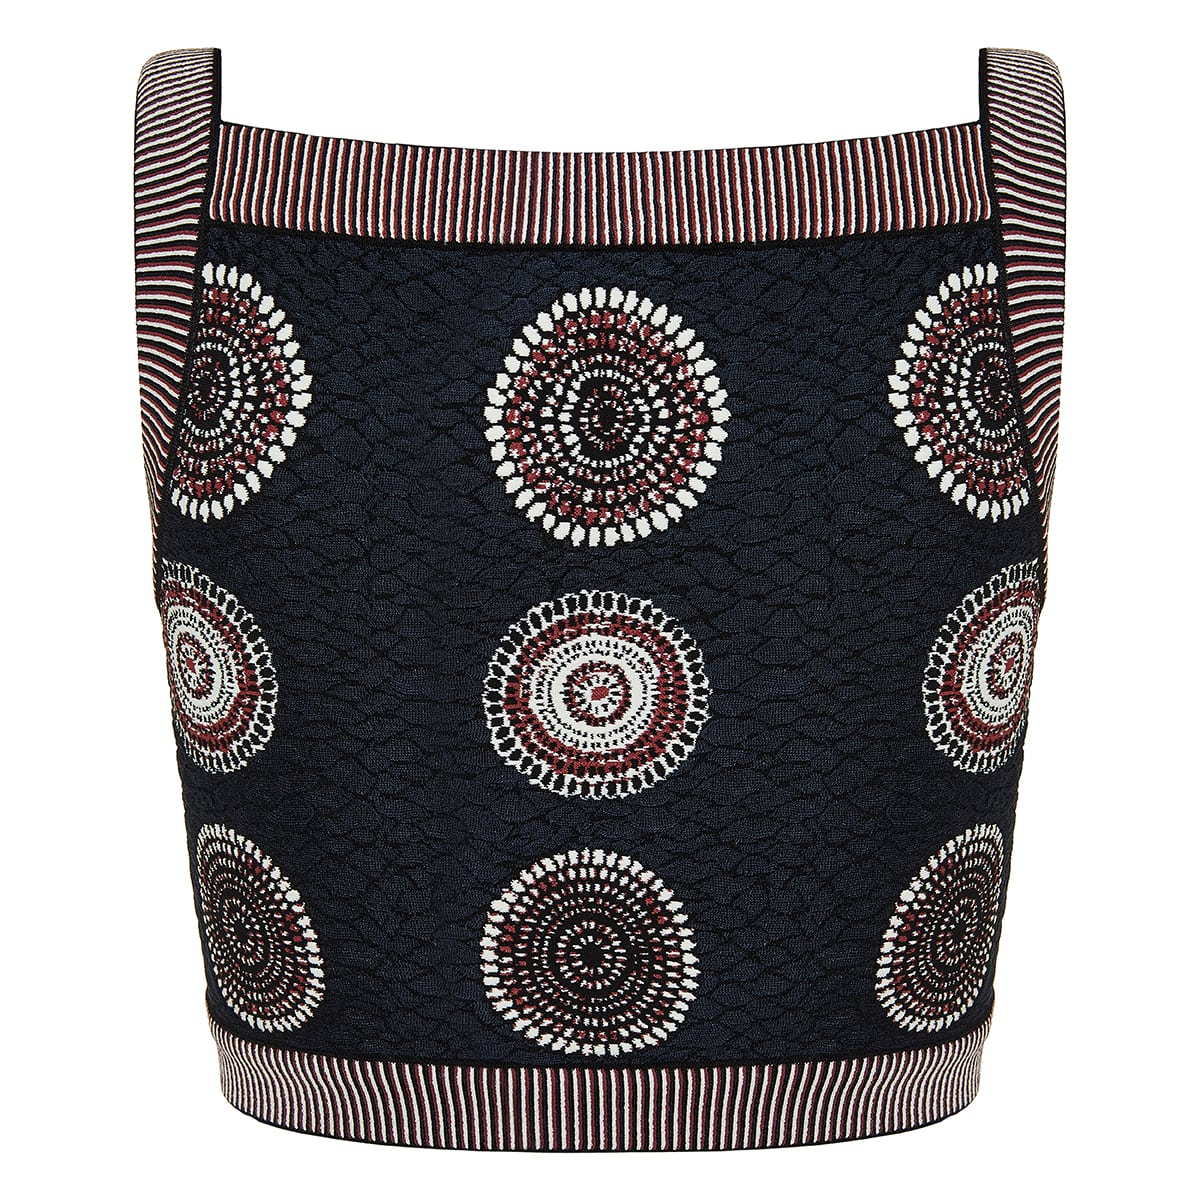 Molukai patterned cropped top